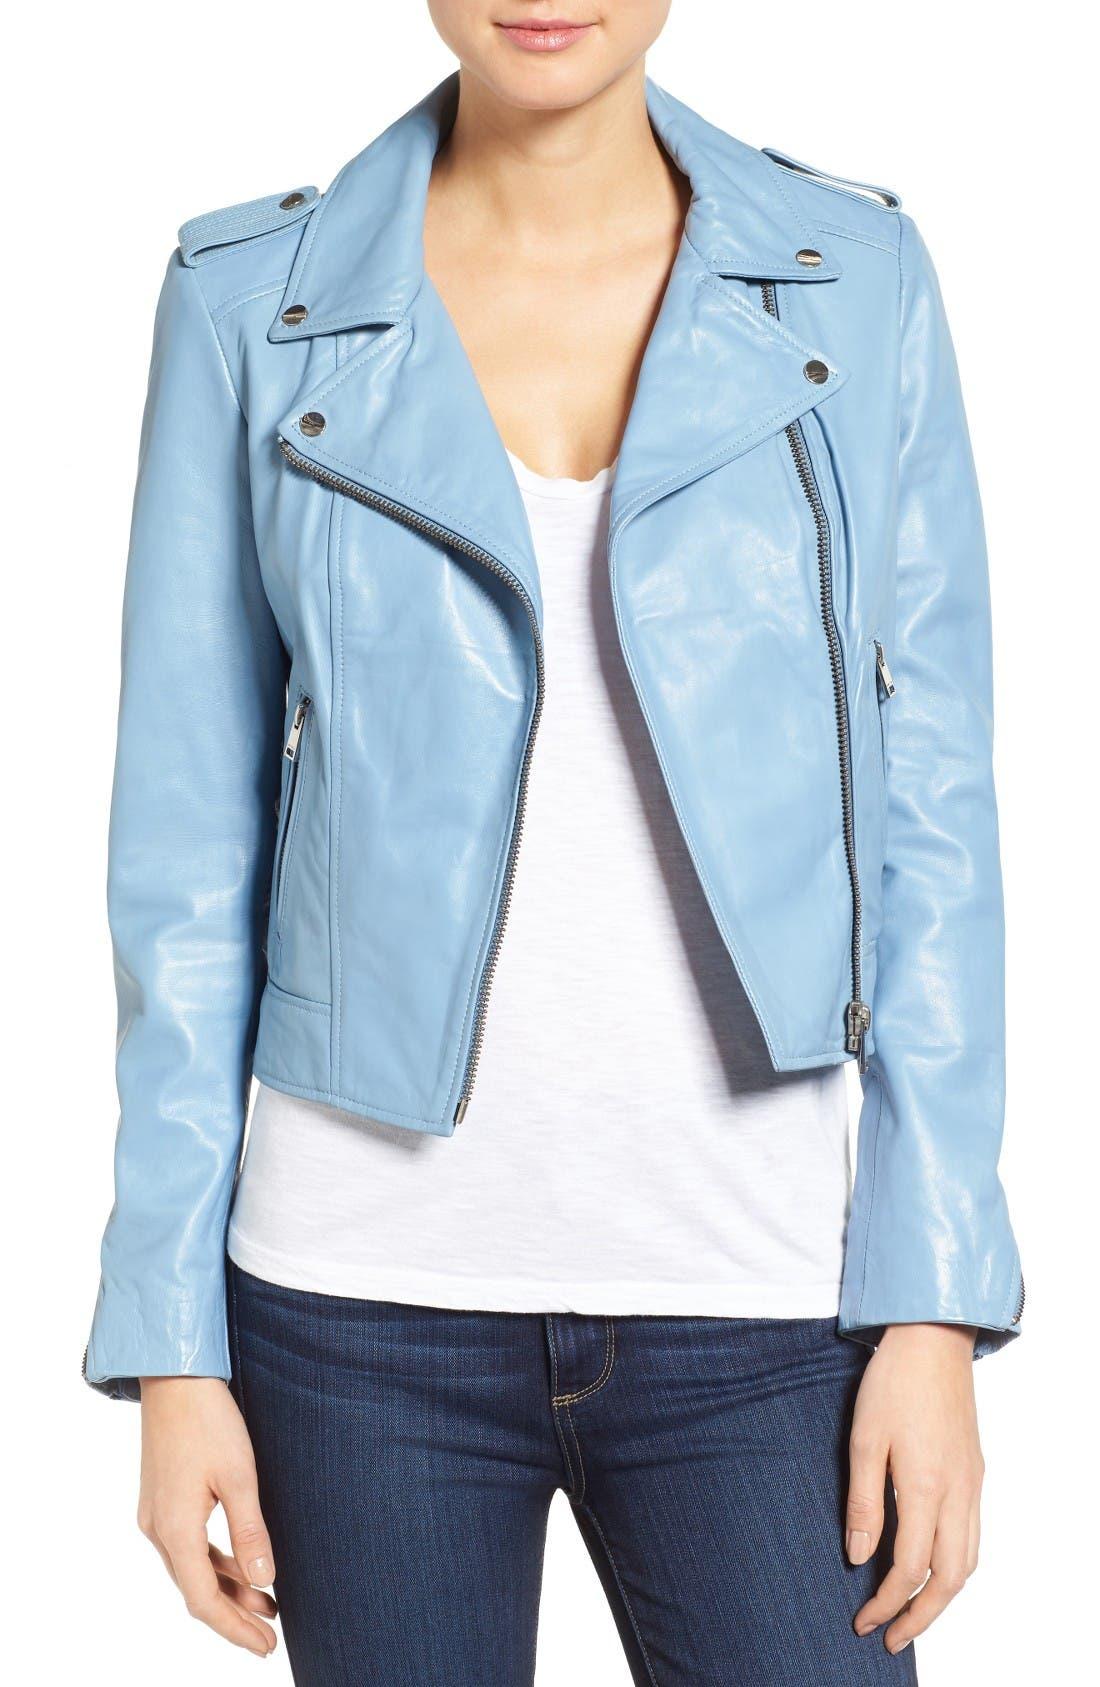 Donna Lambskin Leather Moto Jacket,                             Main thumbnail 1, color,                             Powder Blue